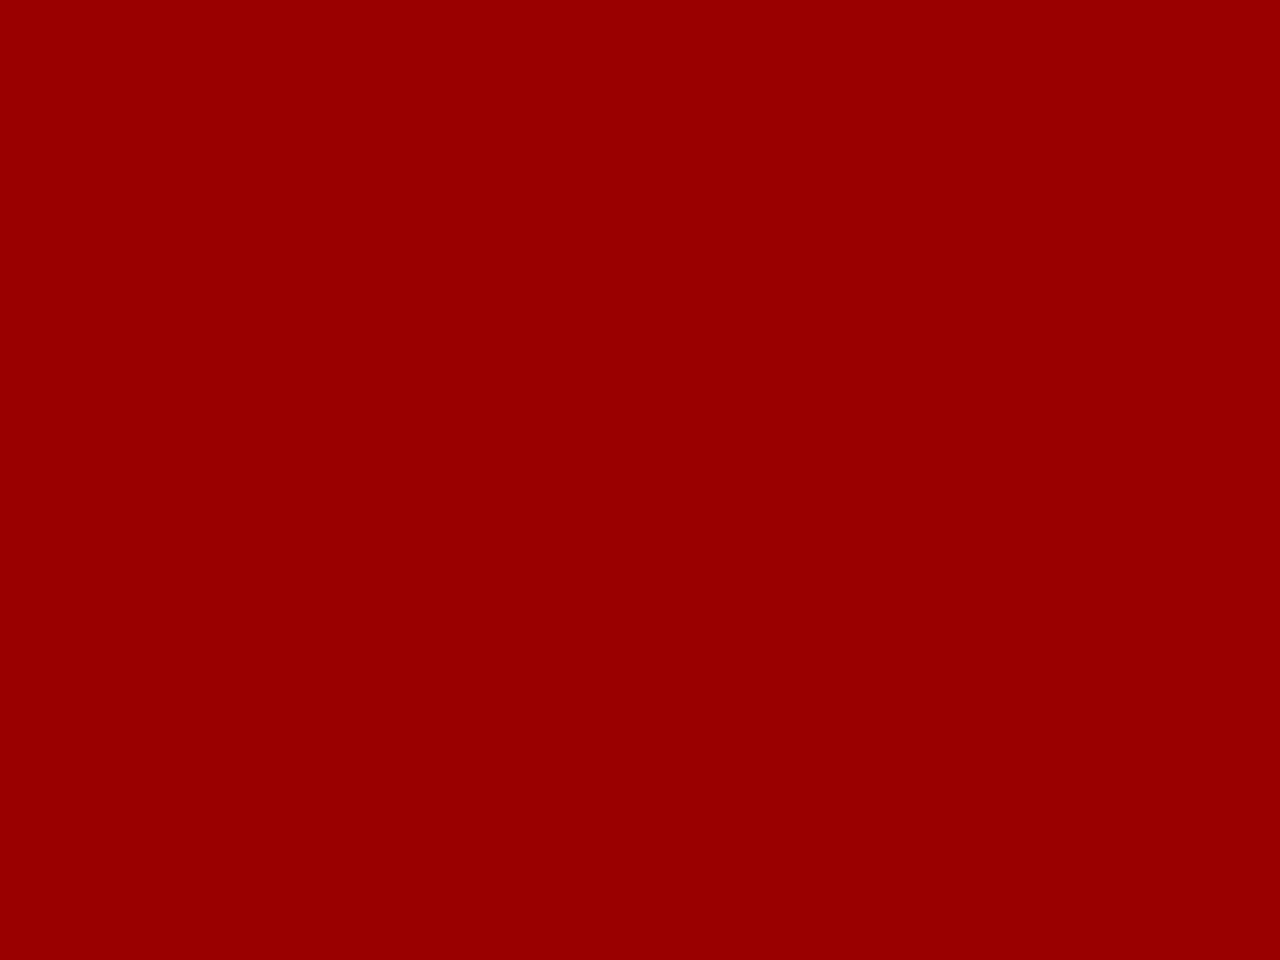 1280x960 Stizza Solid Color Background